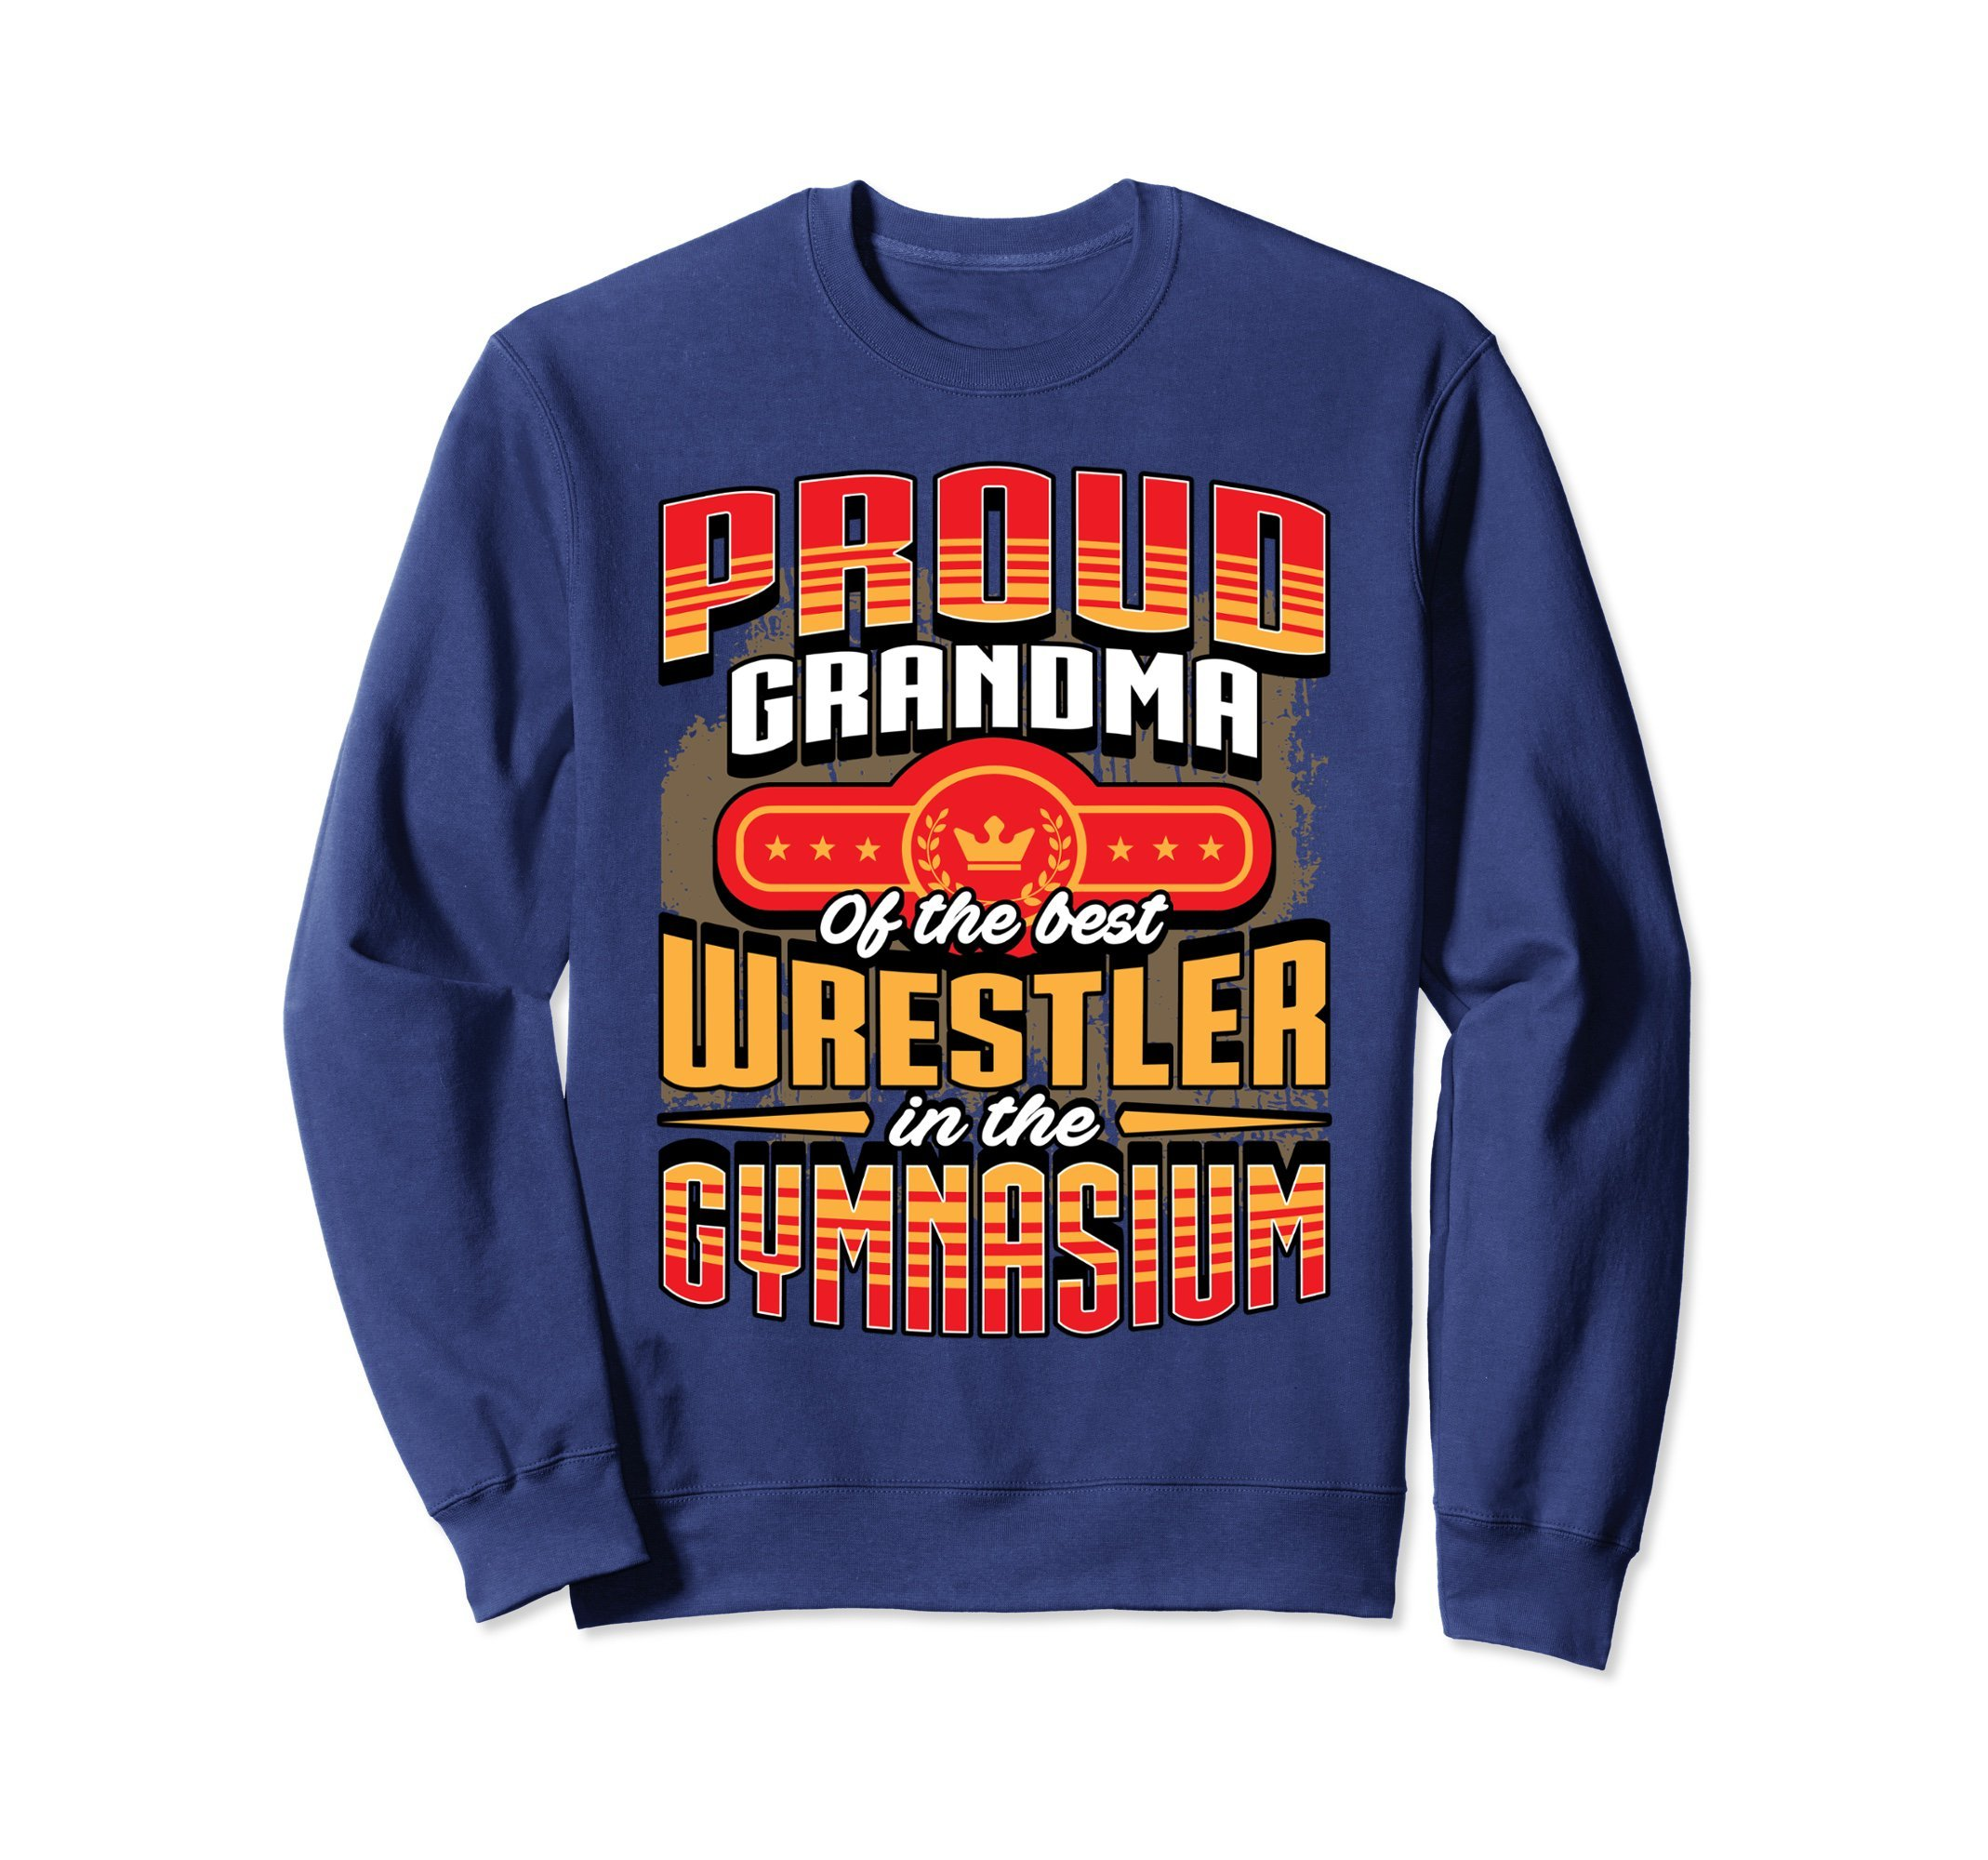 Unisex Wrestling Sweatshirt - Proud Grandma Wrestling Sweater XL: Navy by Wrestling Shirt by Crush Retro